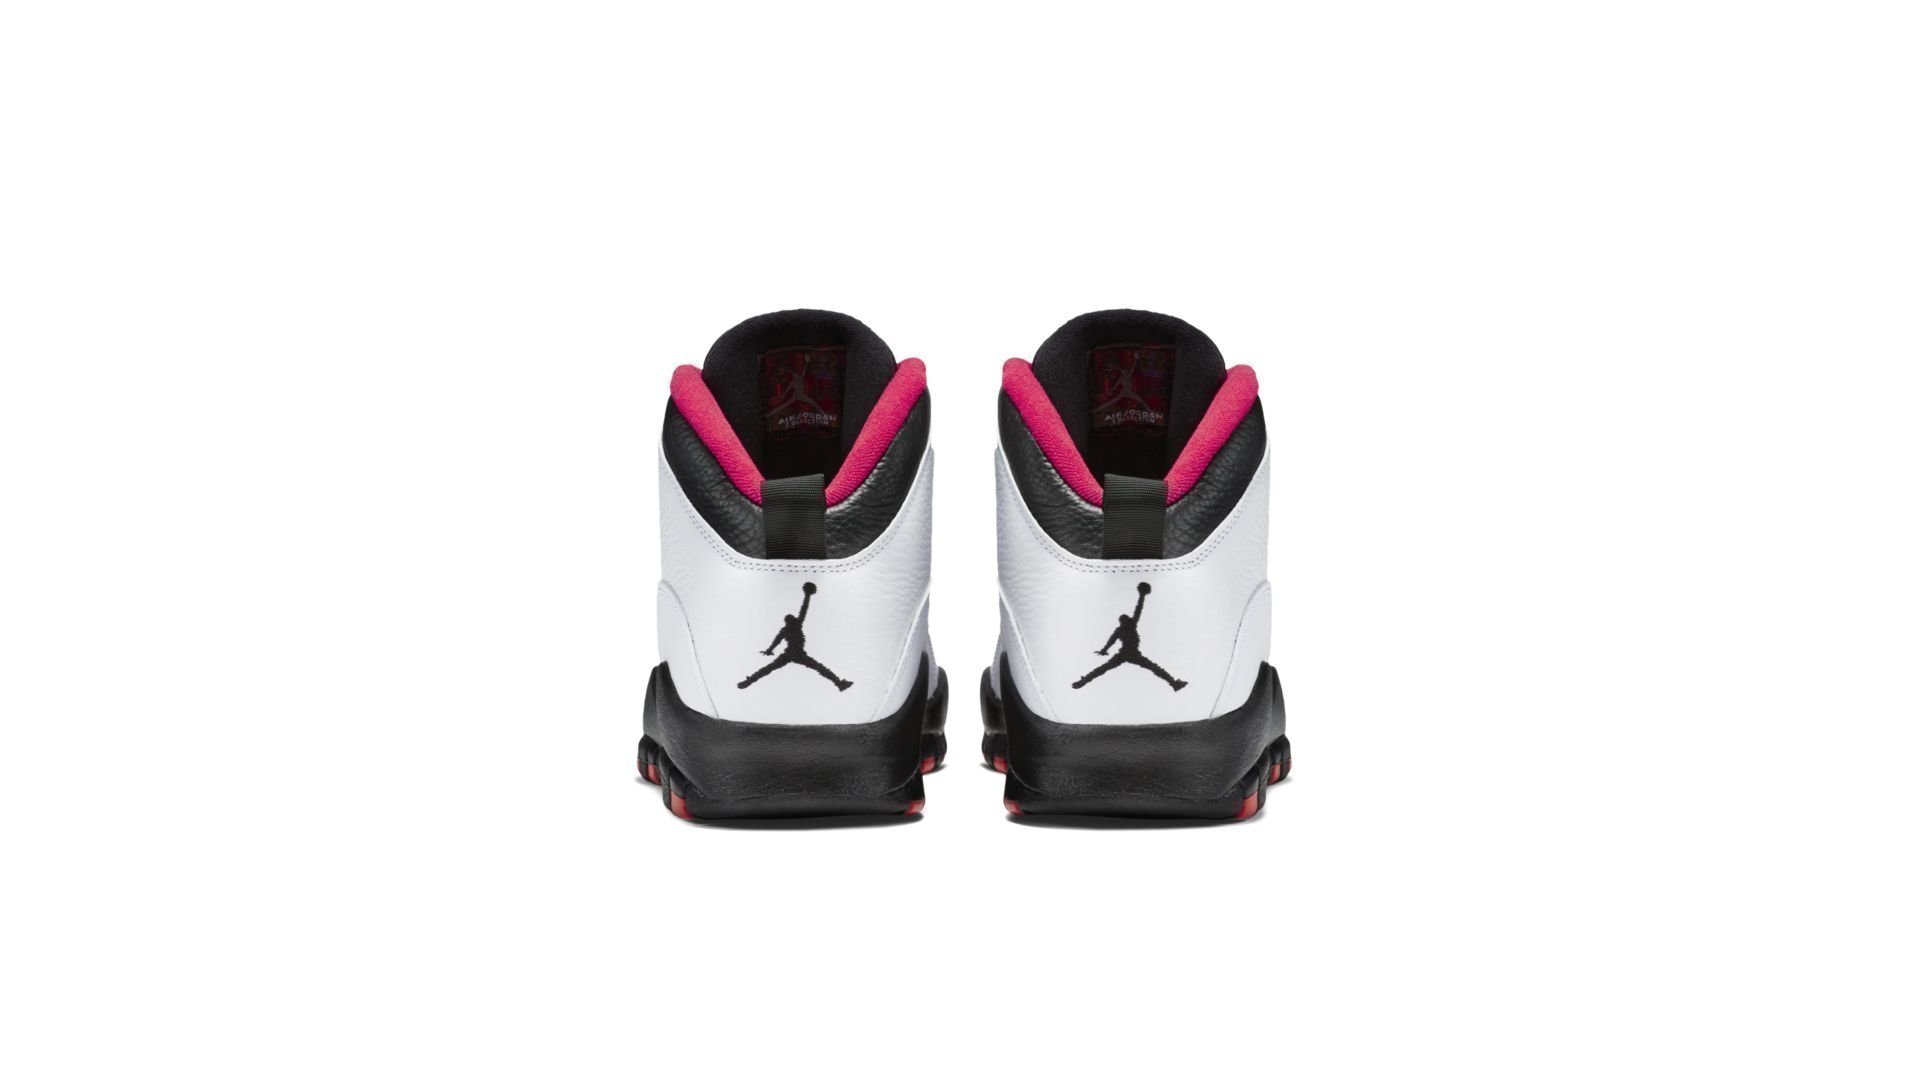 Jordan 10 Retro Double Nickel (310805-102)